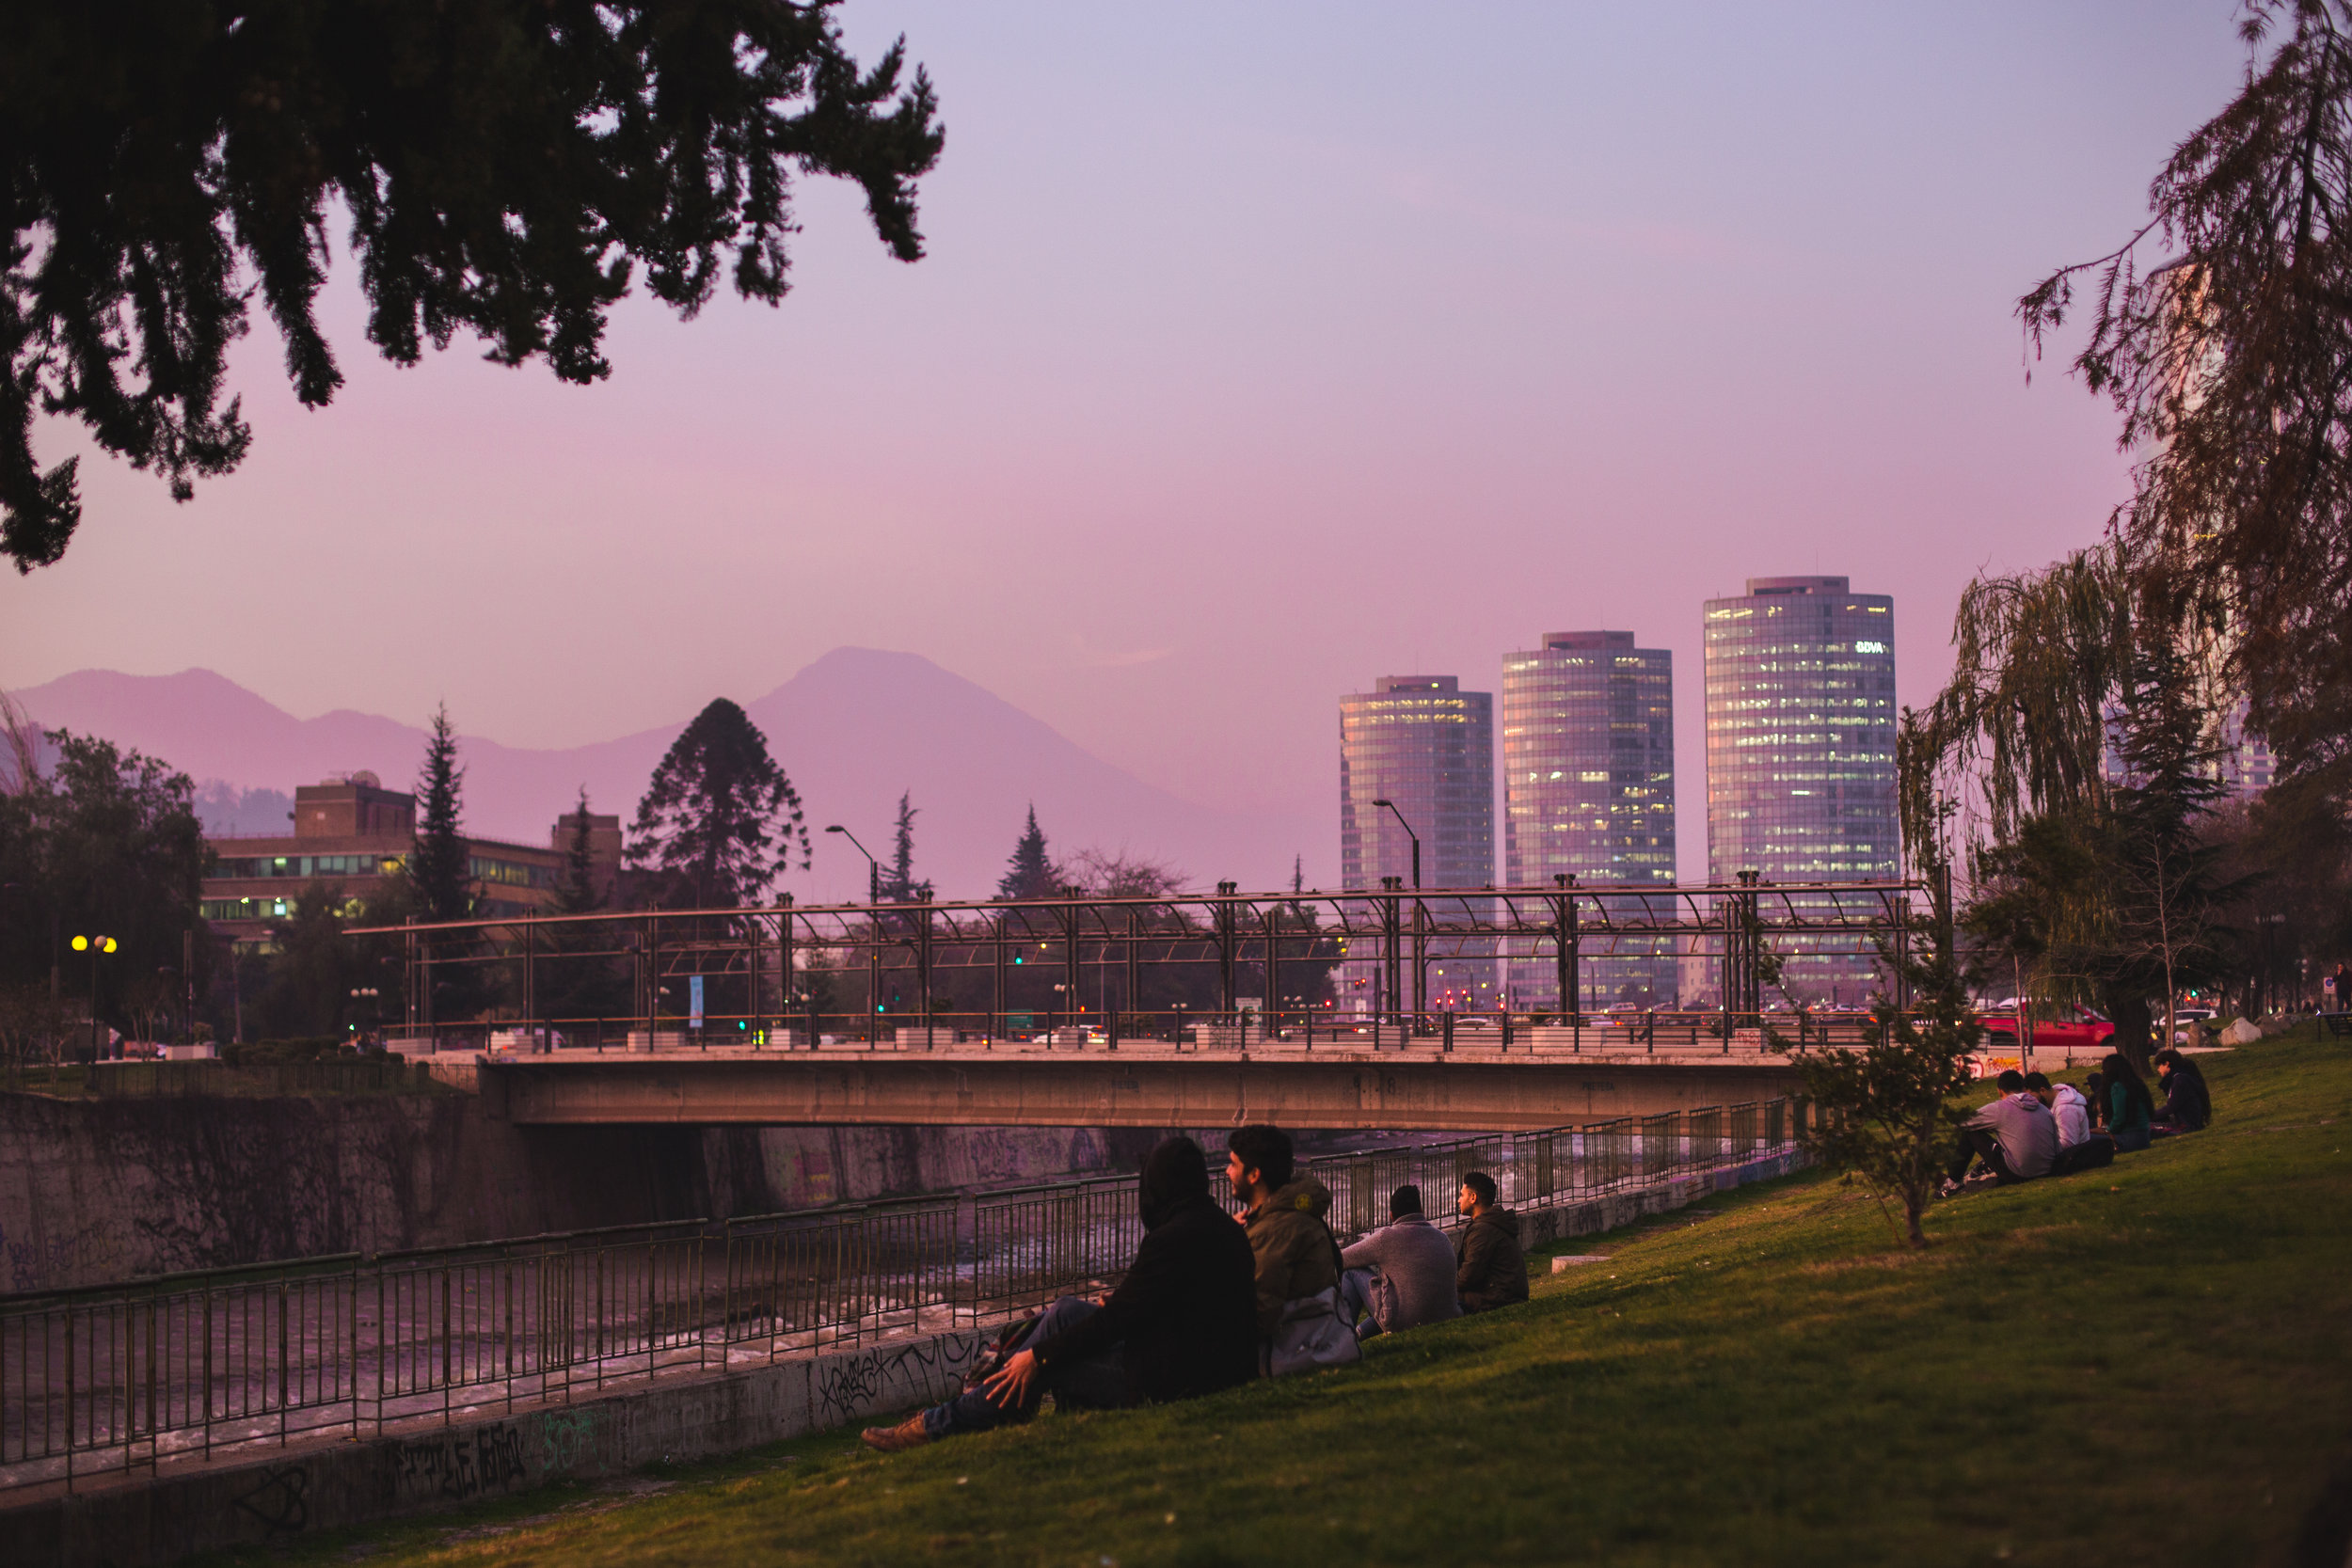 Chile_Santiago_2017_2.JPG